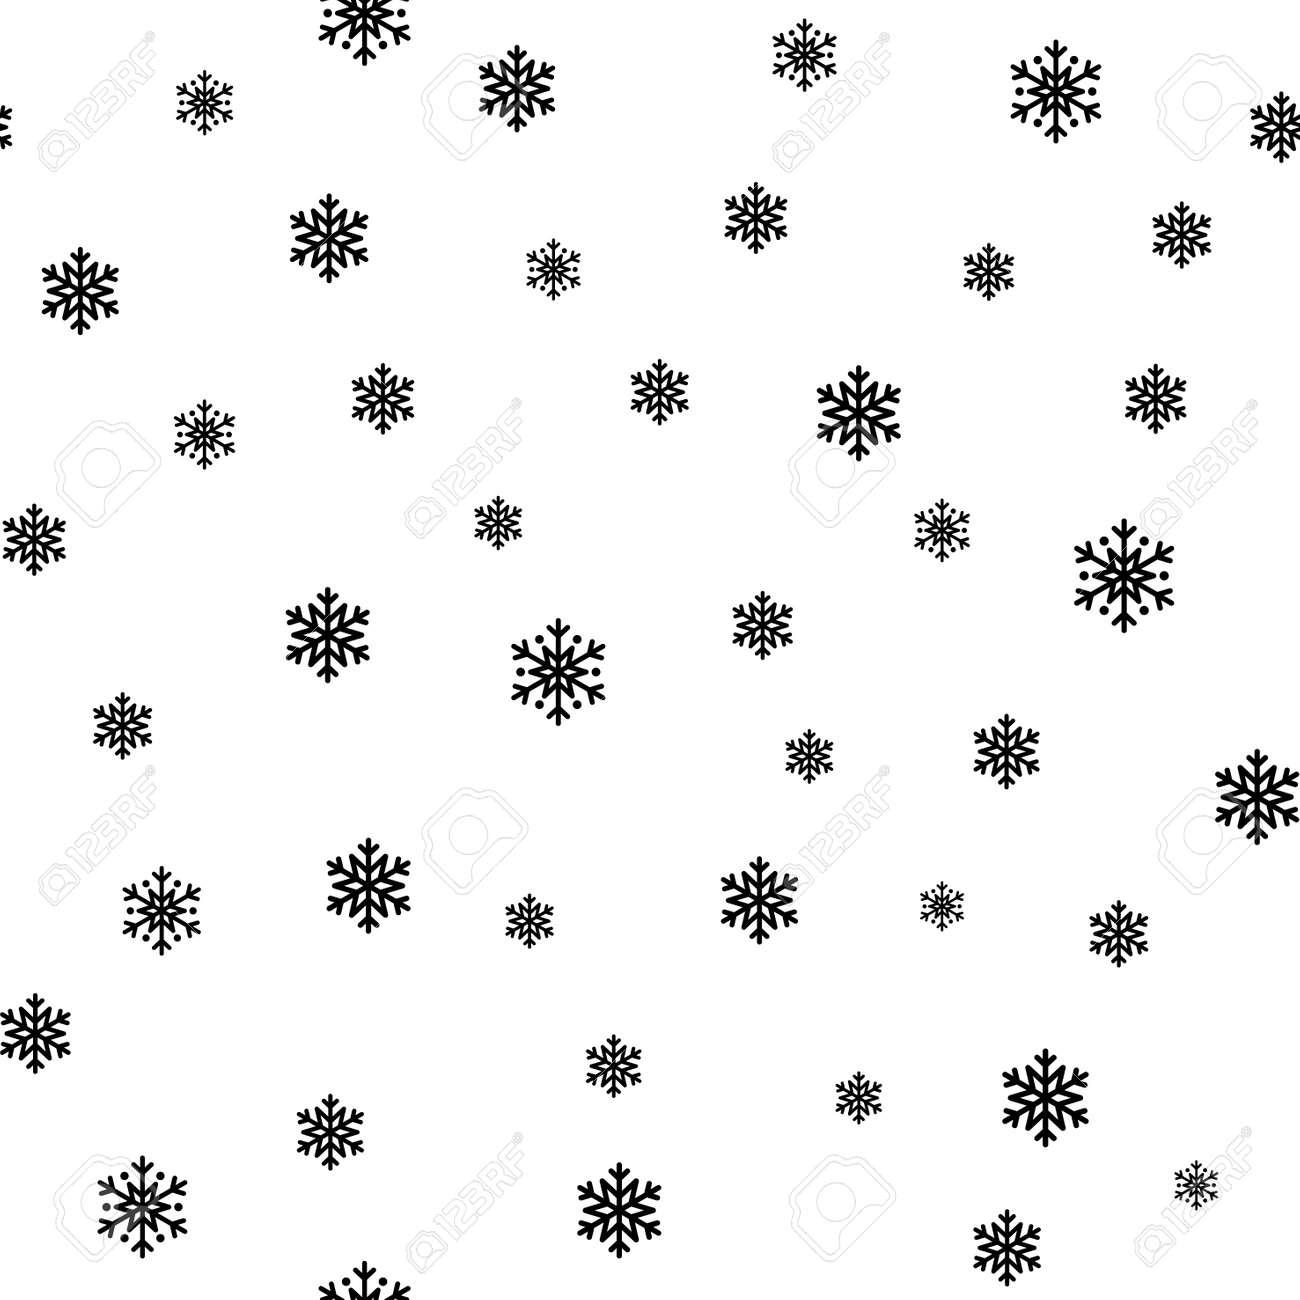 Snowflake Simple Seamless Pattern Black Snow On White Background